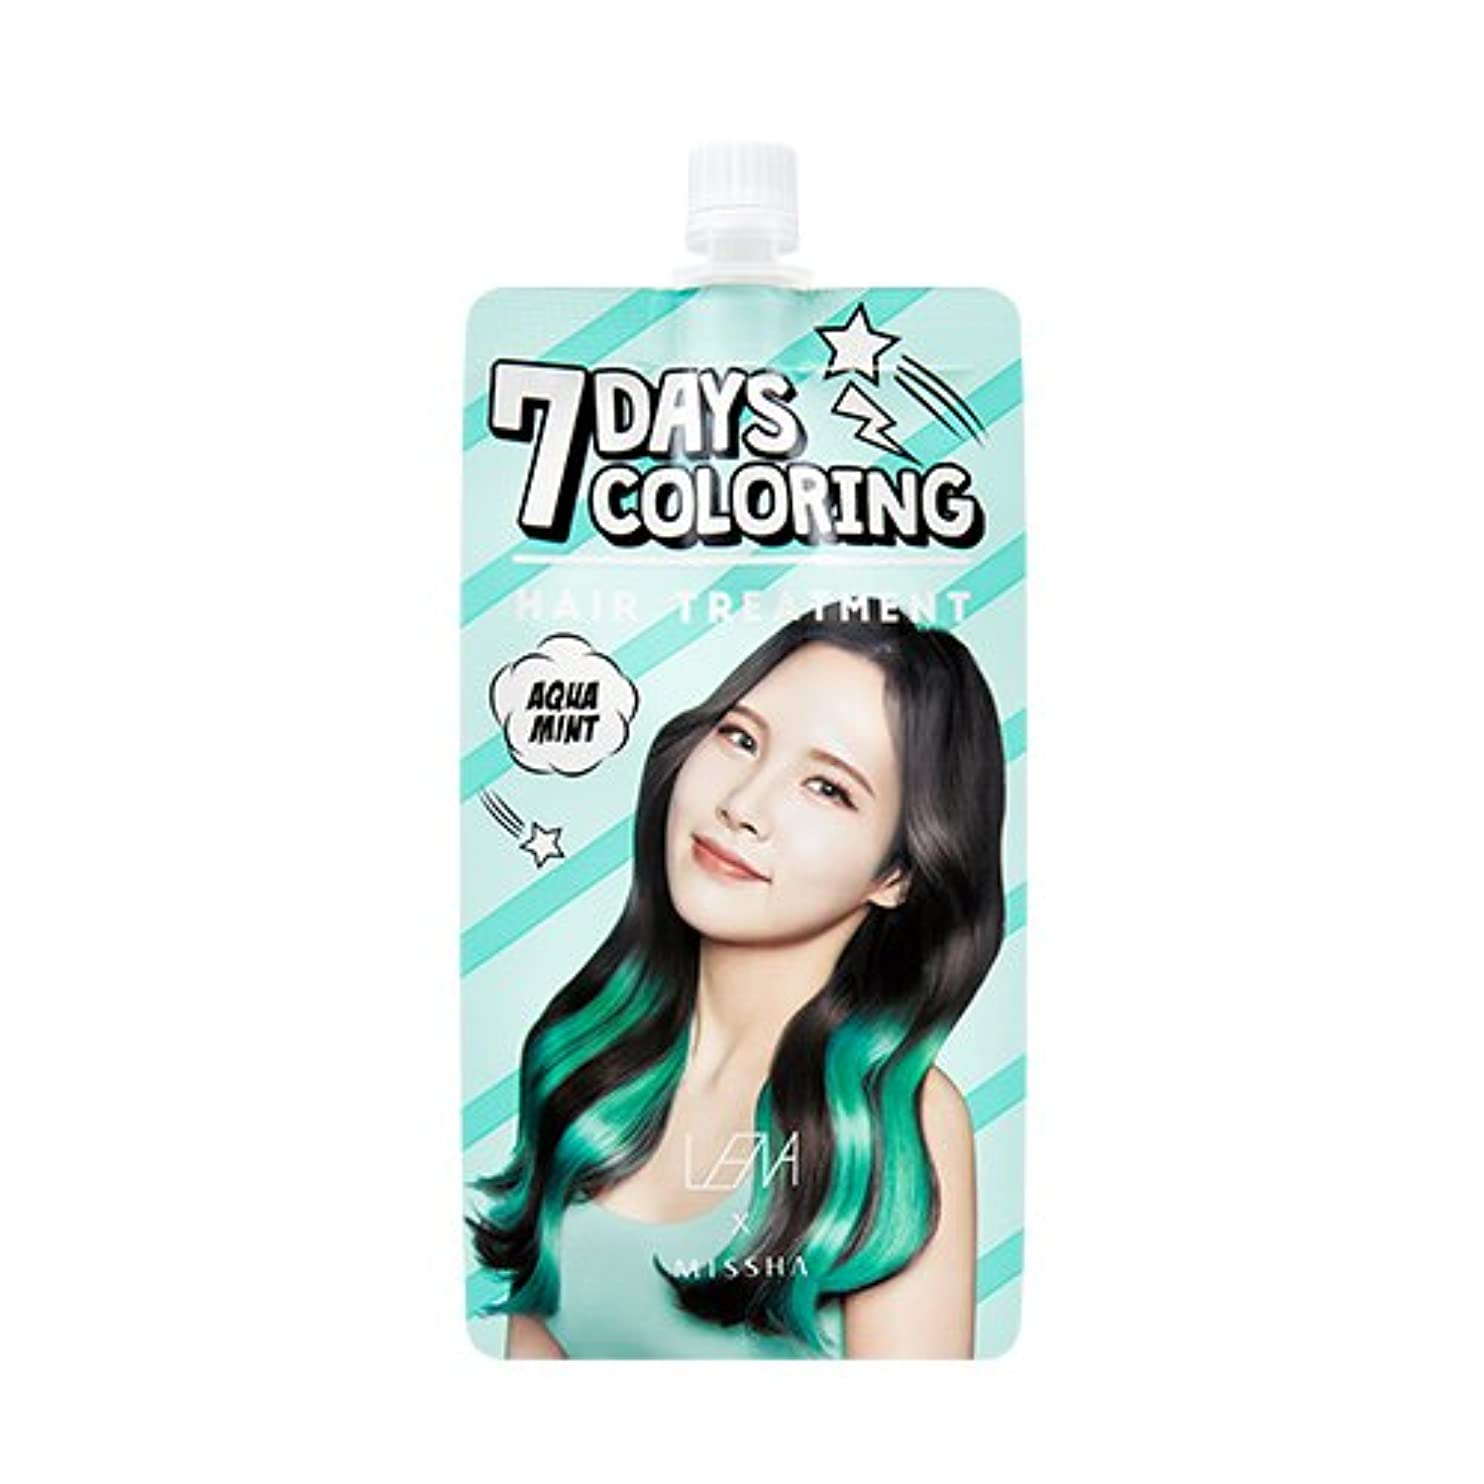 MISSHA Seven Days Coloring Hair Treatment #Aquamint -LENA Edition /ミシャ セブンデイズカラーリングヘアトリートメント - レナエディション (アクアミント...